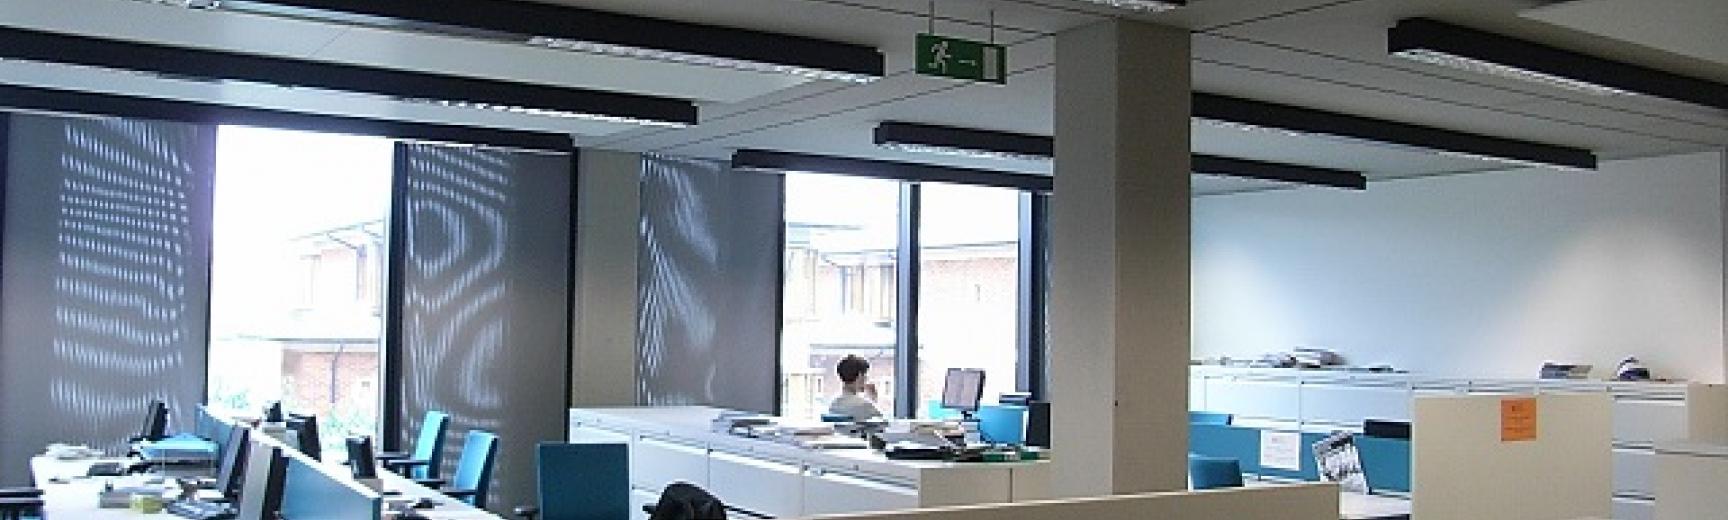 Interior MRB